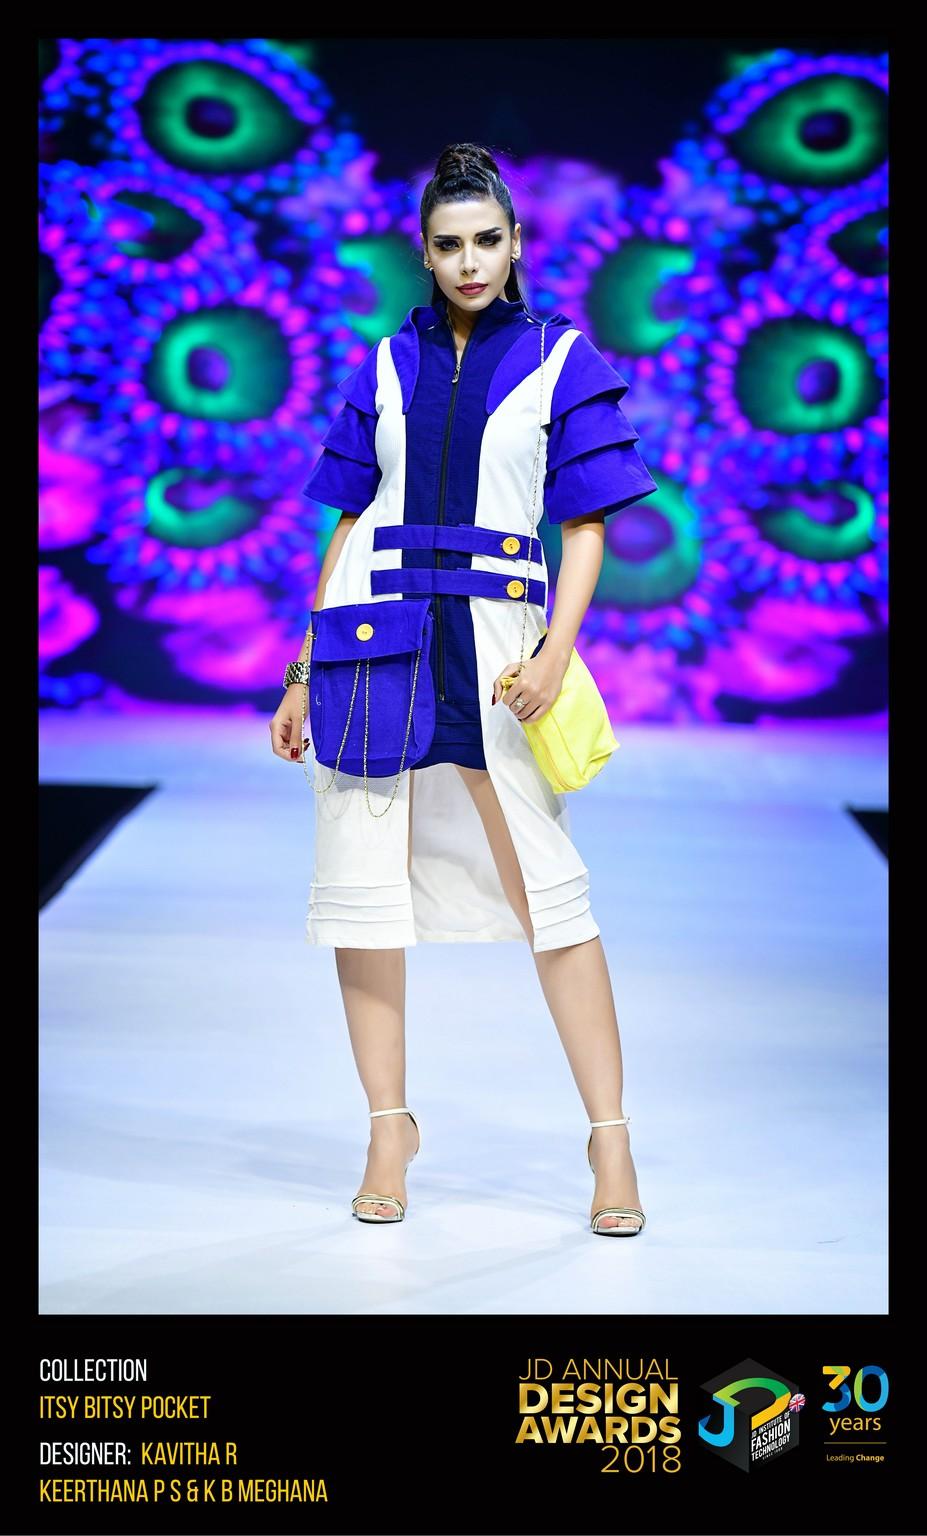 Itsy Bitsy Pocket Dress – Change – JD Annual Design Awards 2018   Designer: Kavitha, Keertana and Meghana   Photography : Jerin Nath (@jerin_nath) itsy bitsy pocket dress - ITSY BITSY POCKET7 - Itsy Bitsy Pocket Dress – Change – JD Annual Design Awards 2018